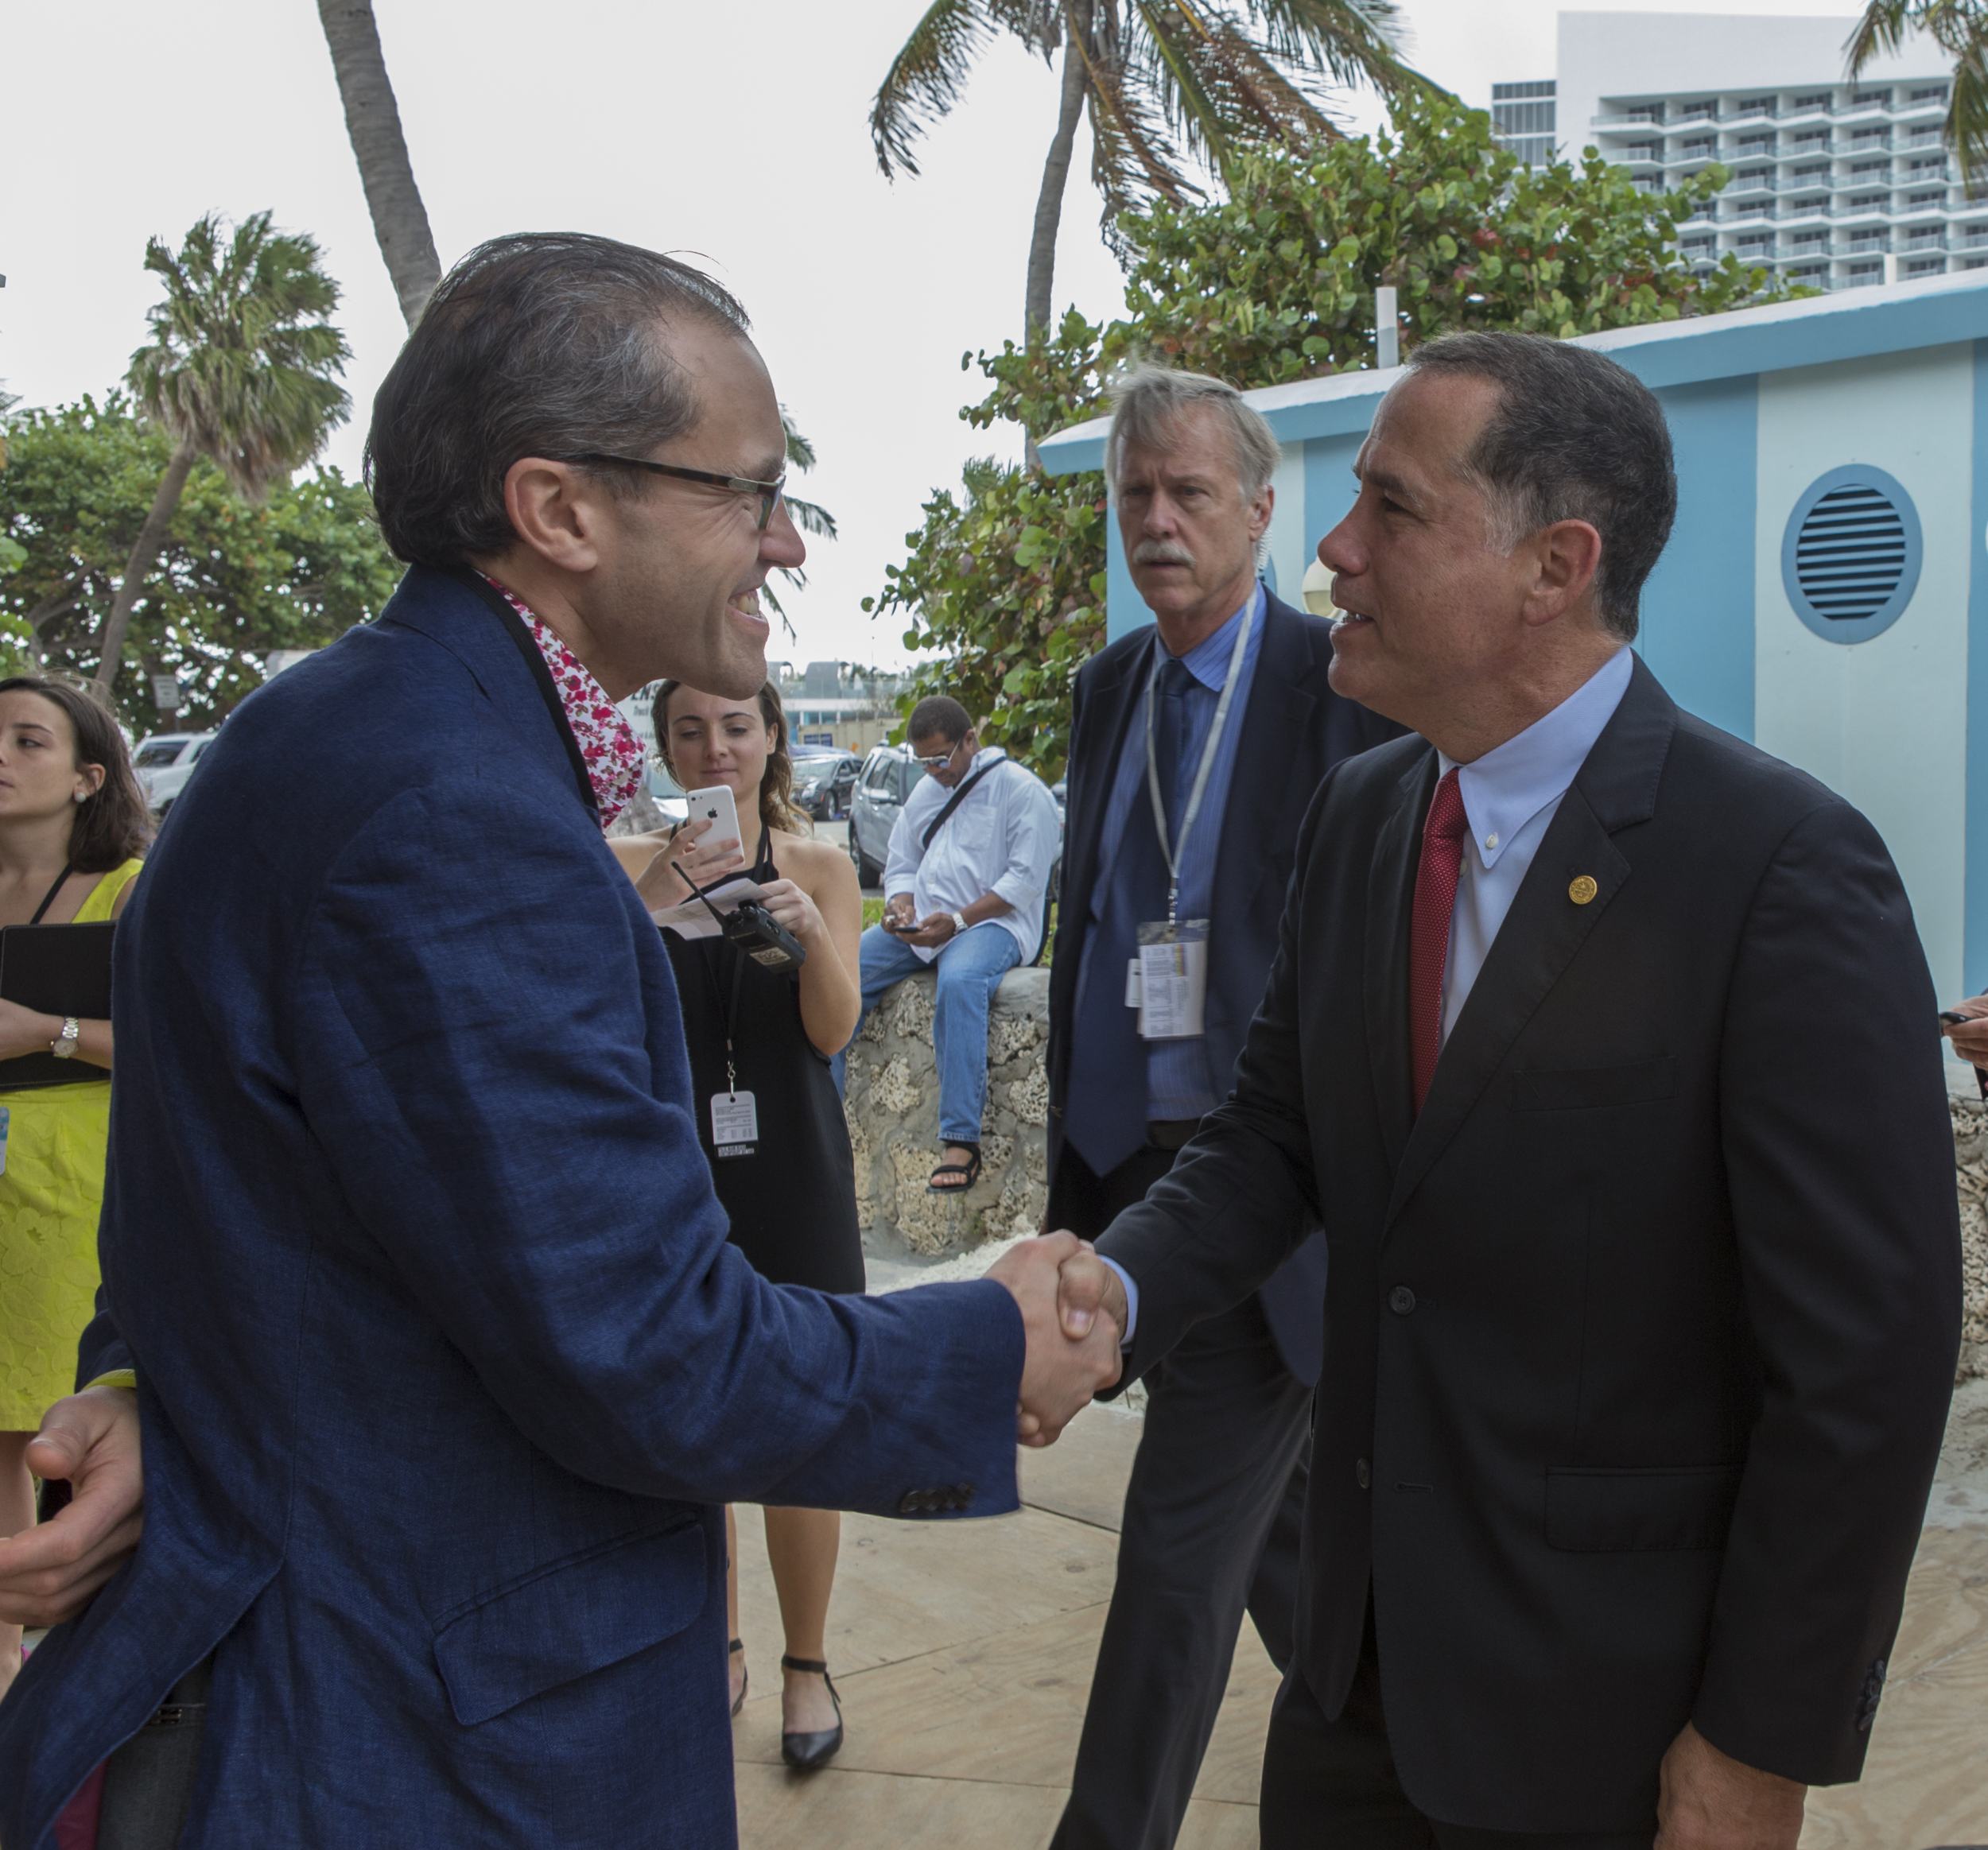 Will Ramsay with Miami Beach Mayor, Philip Levine.